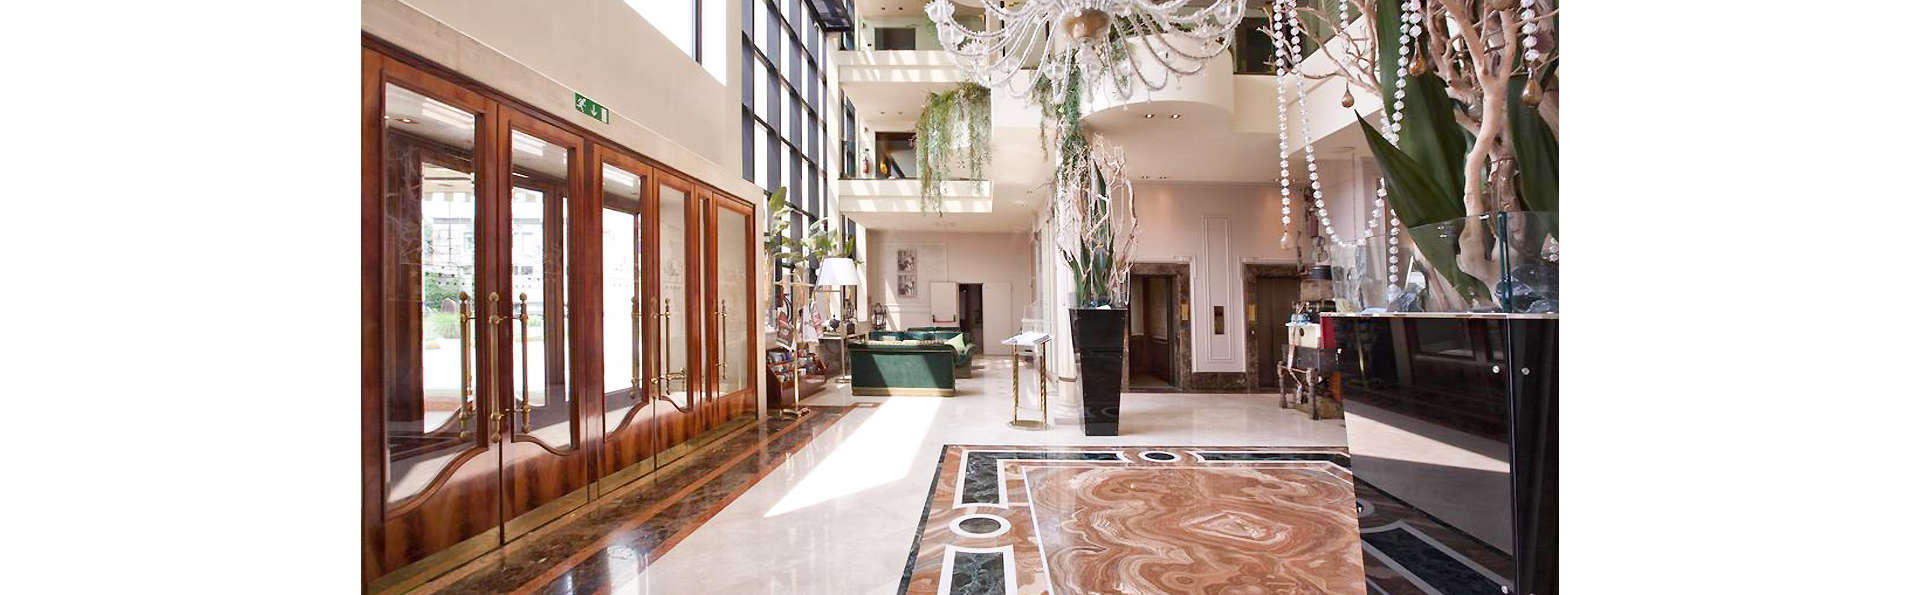 Hotel Leon d'Oro - EDIT_LOBBY_01.jpg